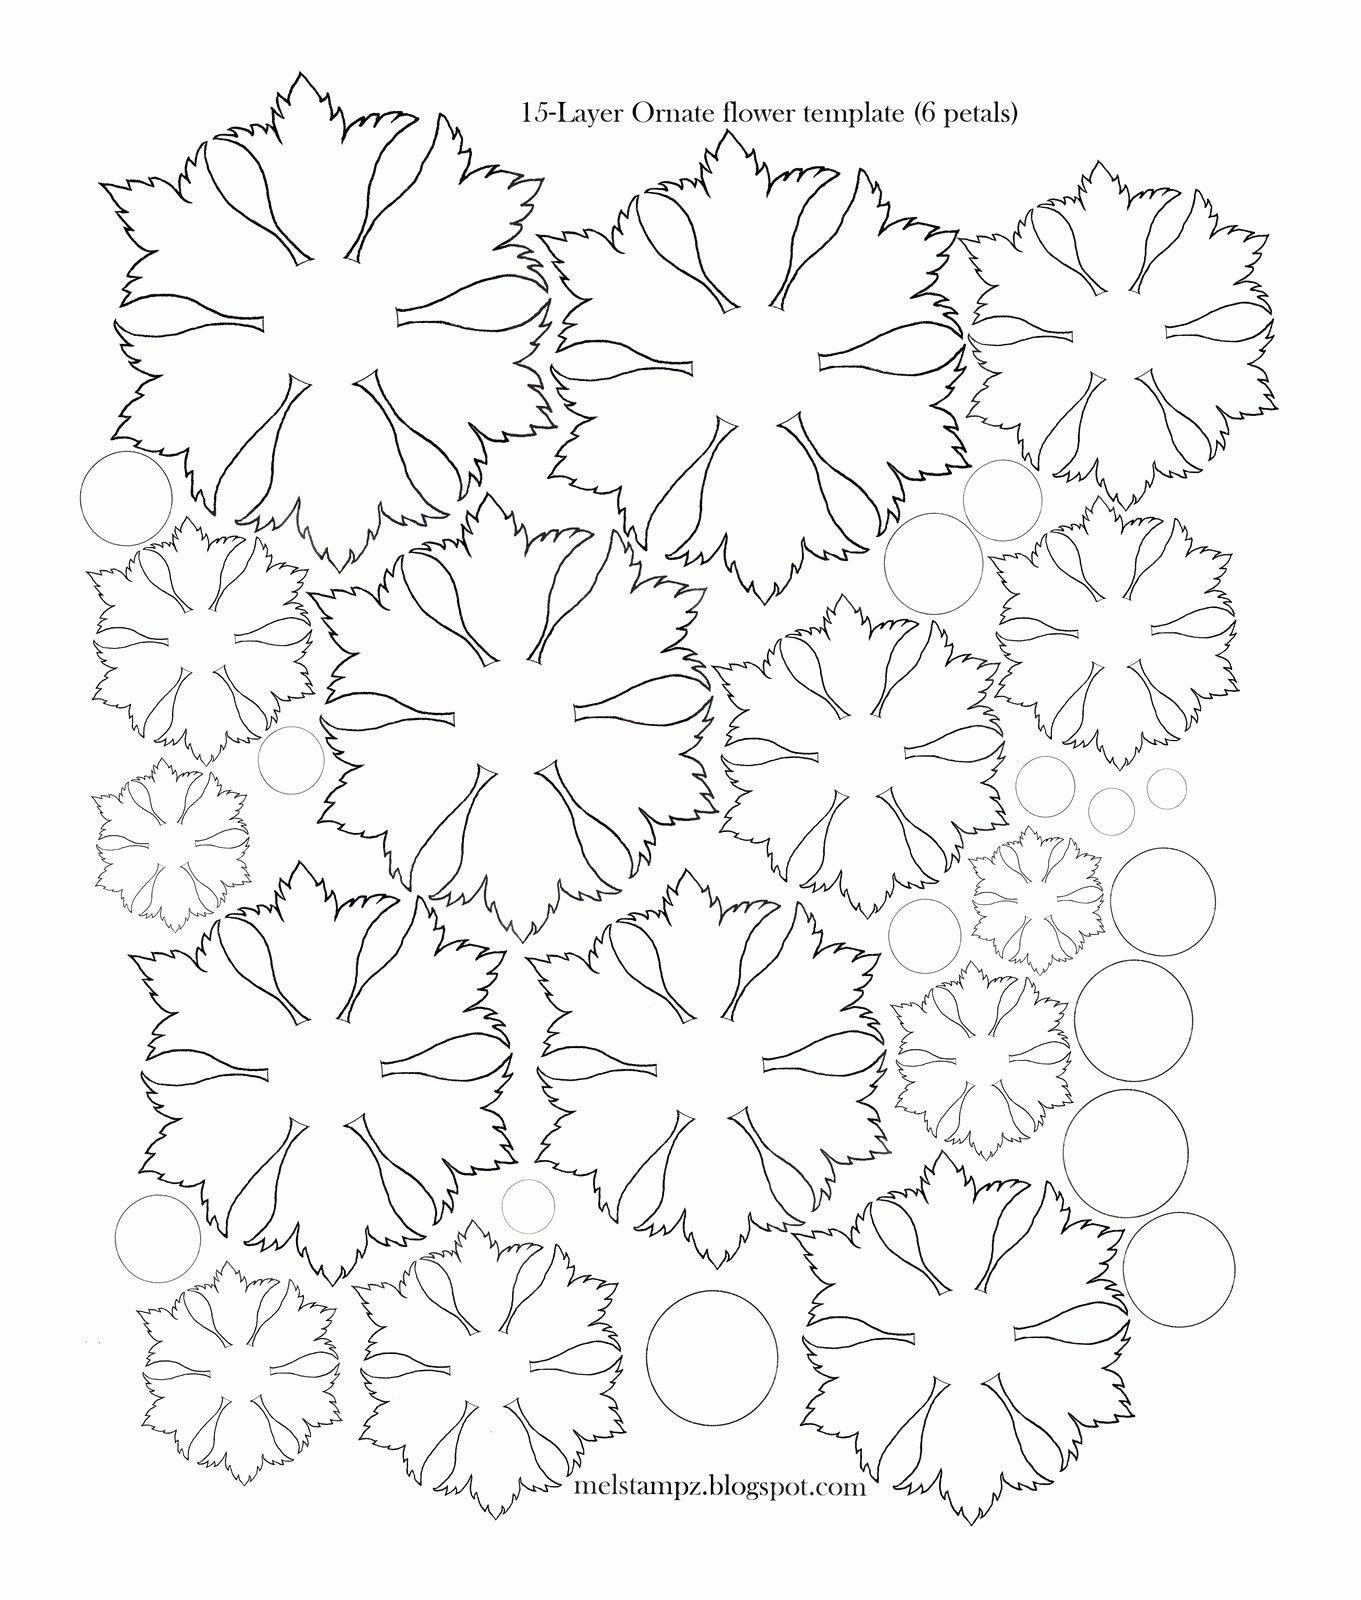 Printable Flower Petal Template Pattern Elegant Mel Stampz 6 Petal ornate Flower Template